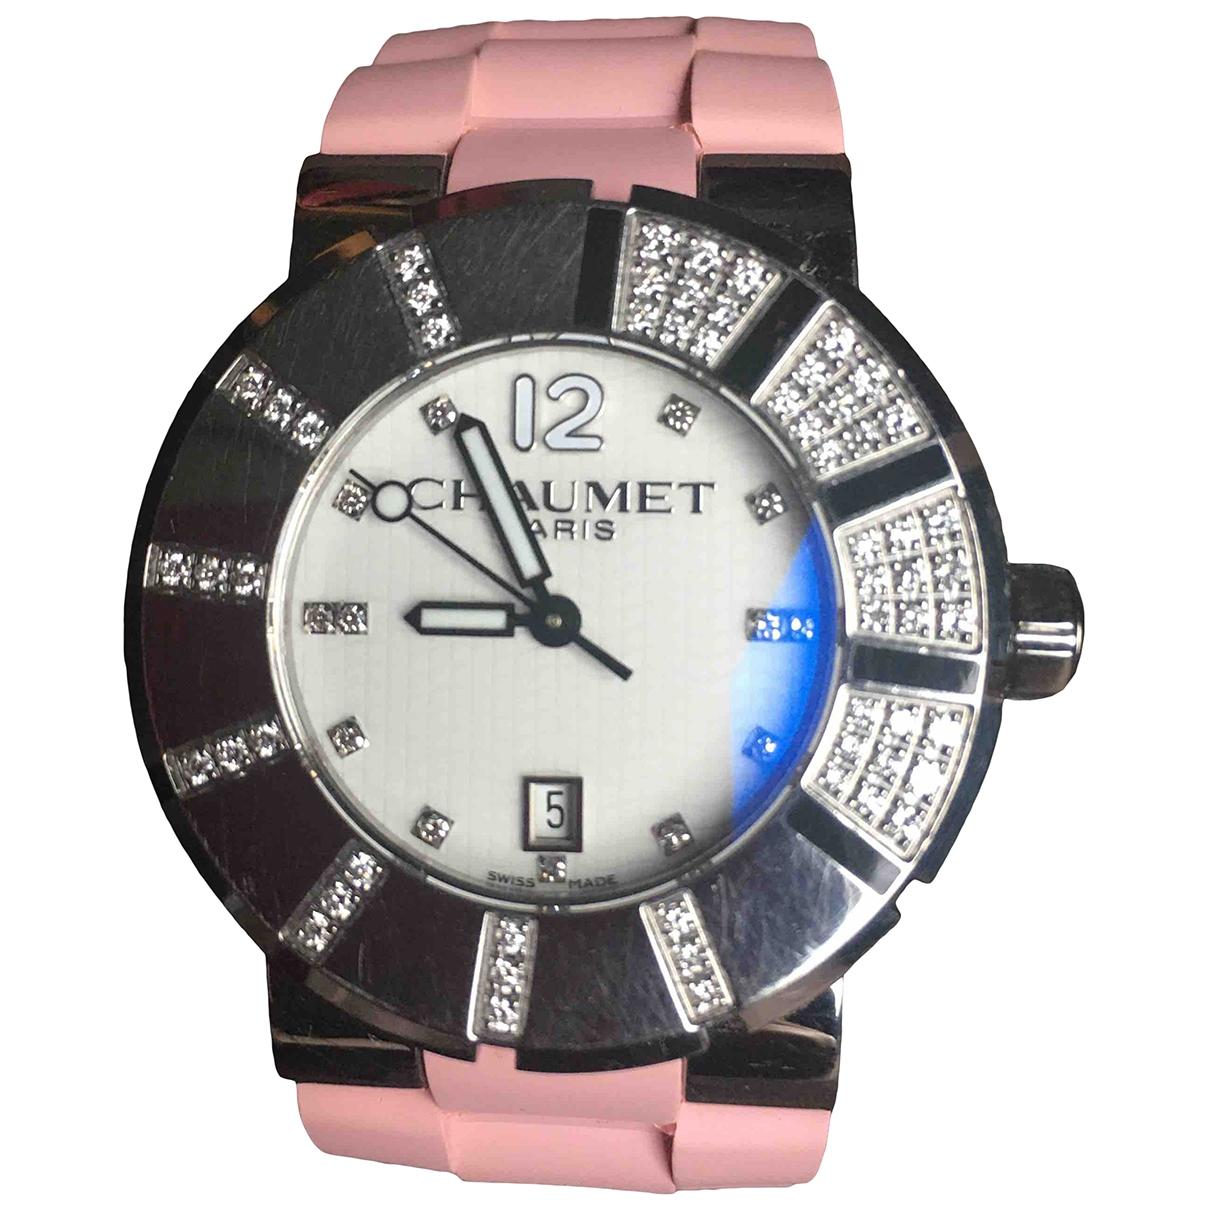 Chaumet Class One Uhr in  Metallic Stahl